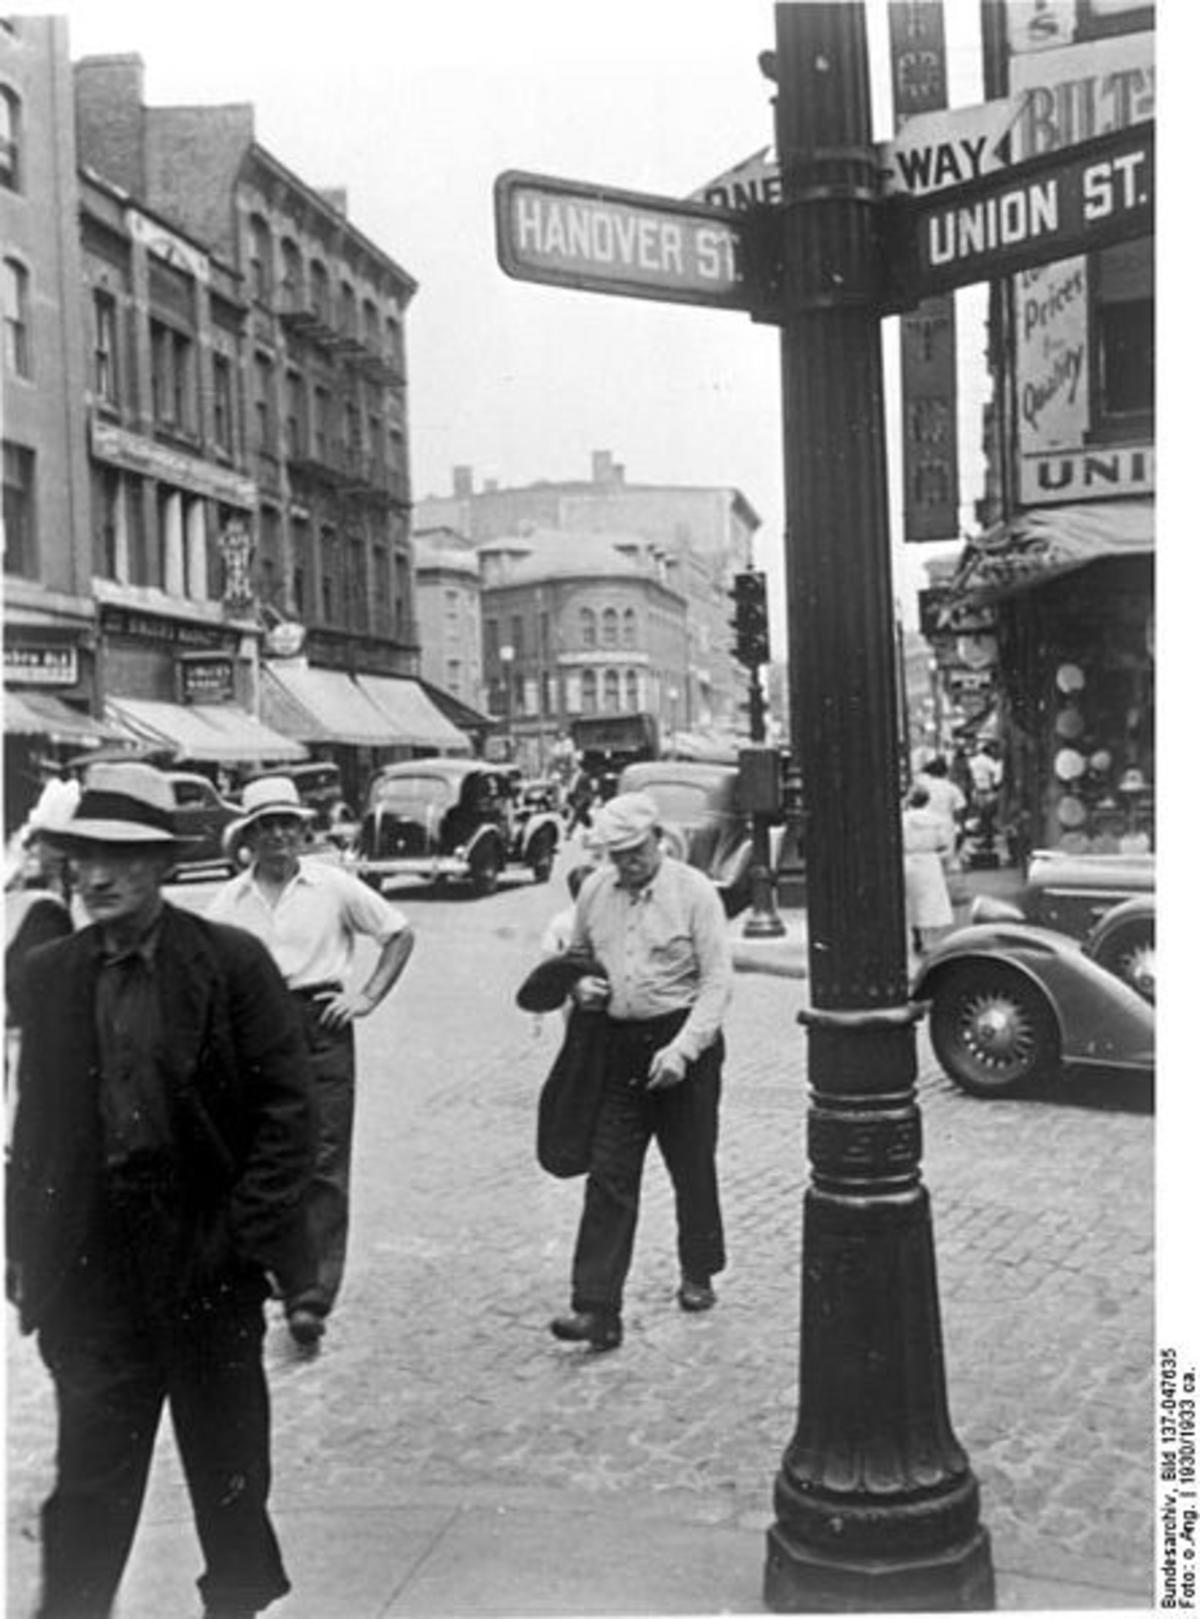 Hanover Street, Boston, 1930